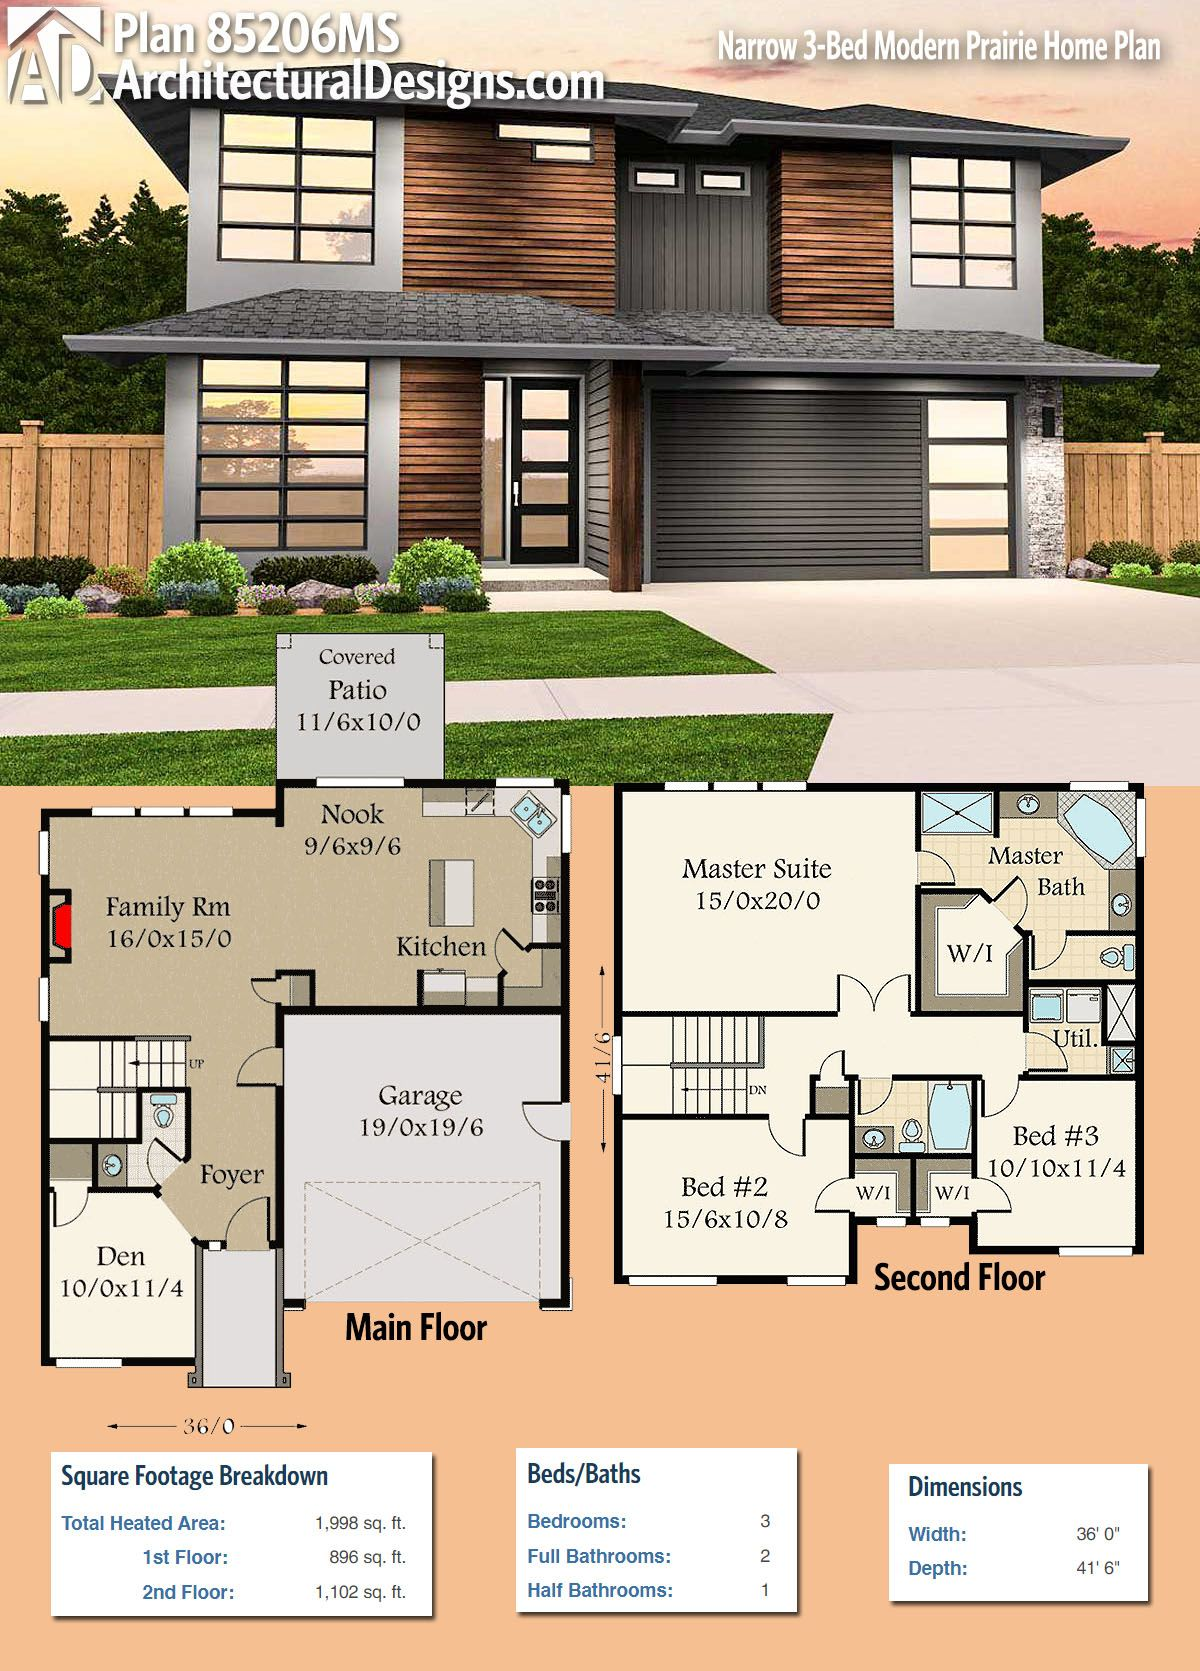 Plan 85206MS Narrow 3Bed Modern Prairie Home Plan Modern house